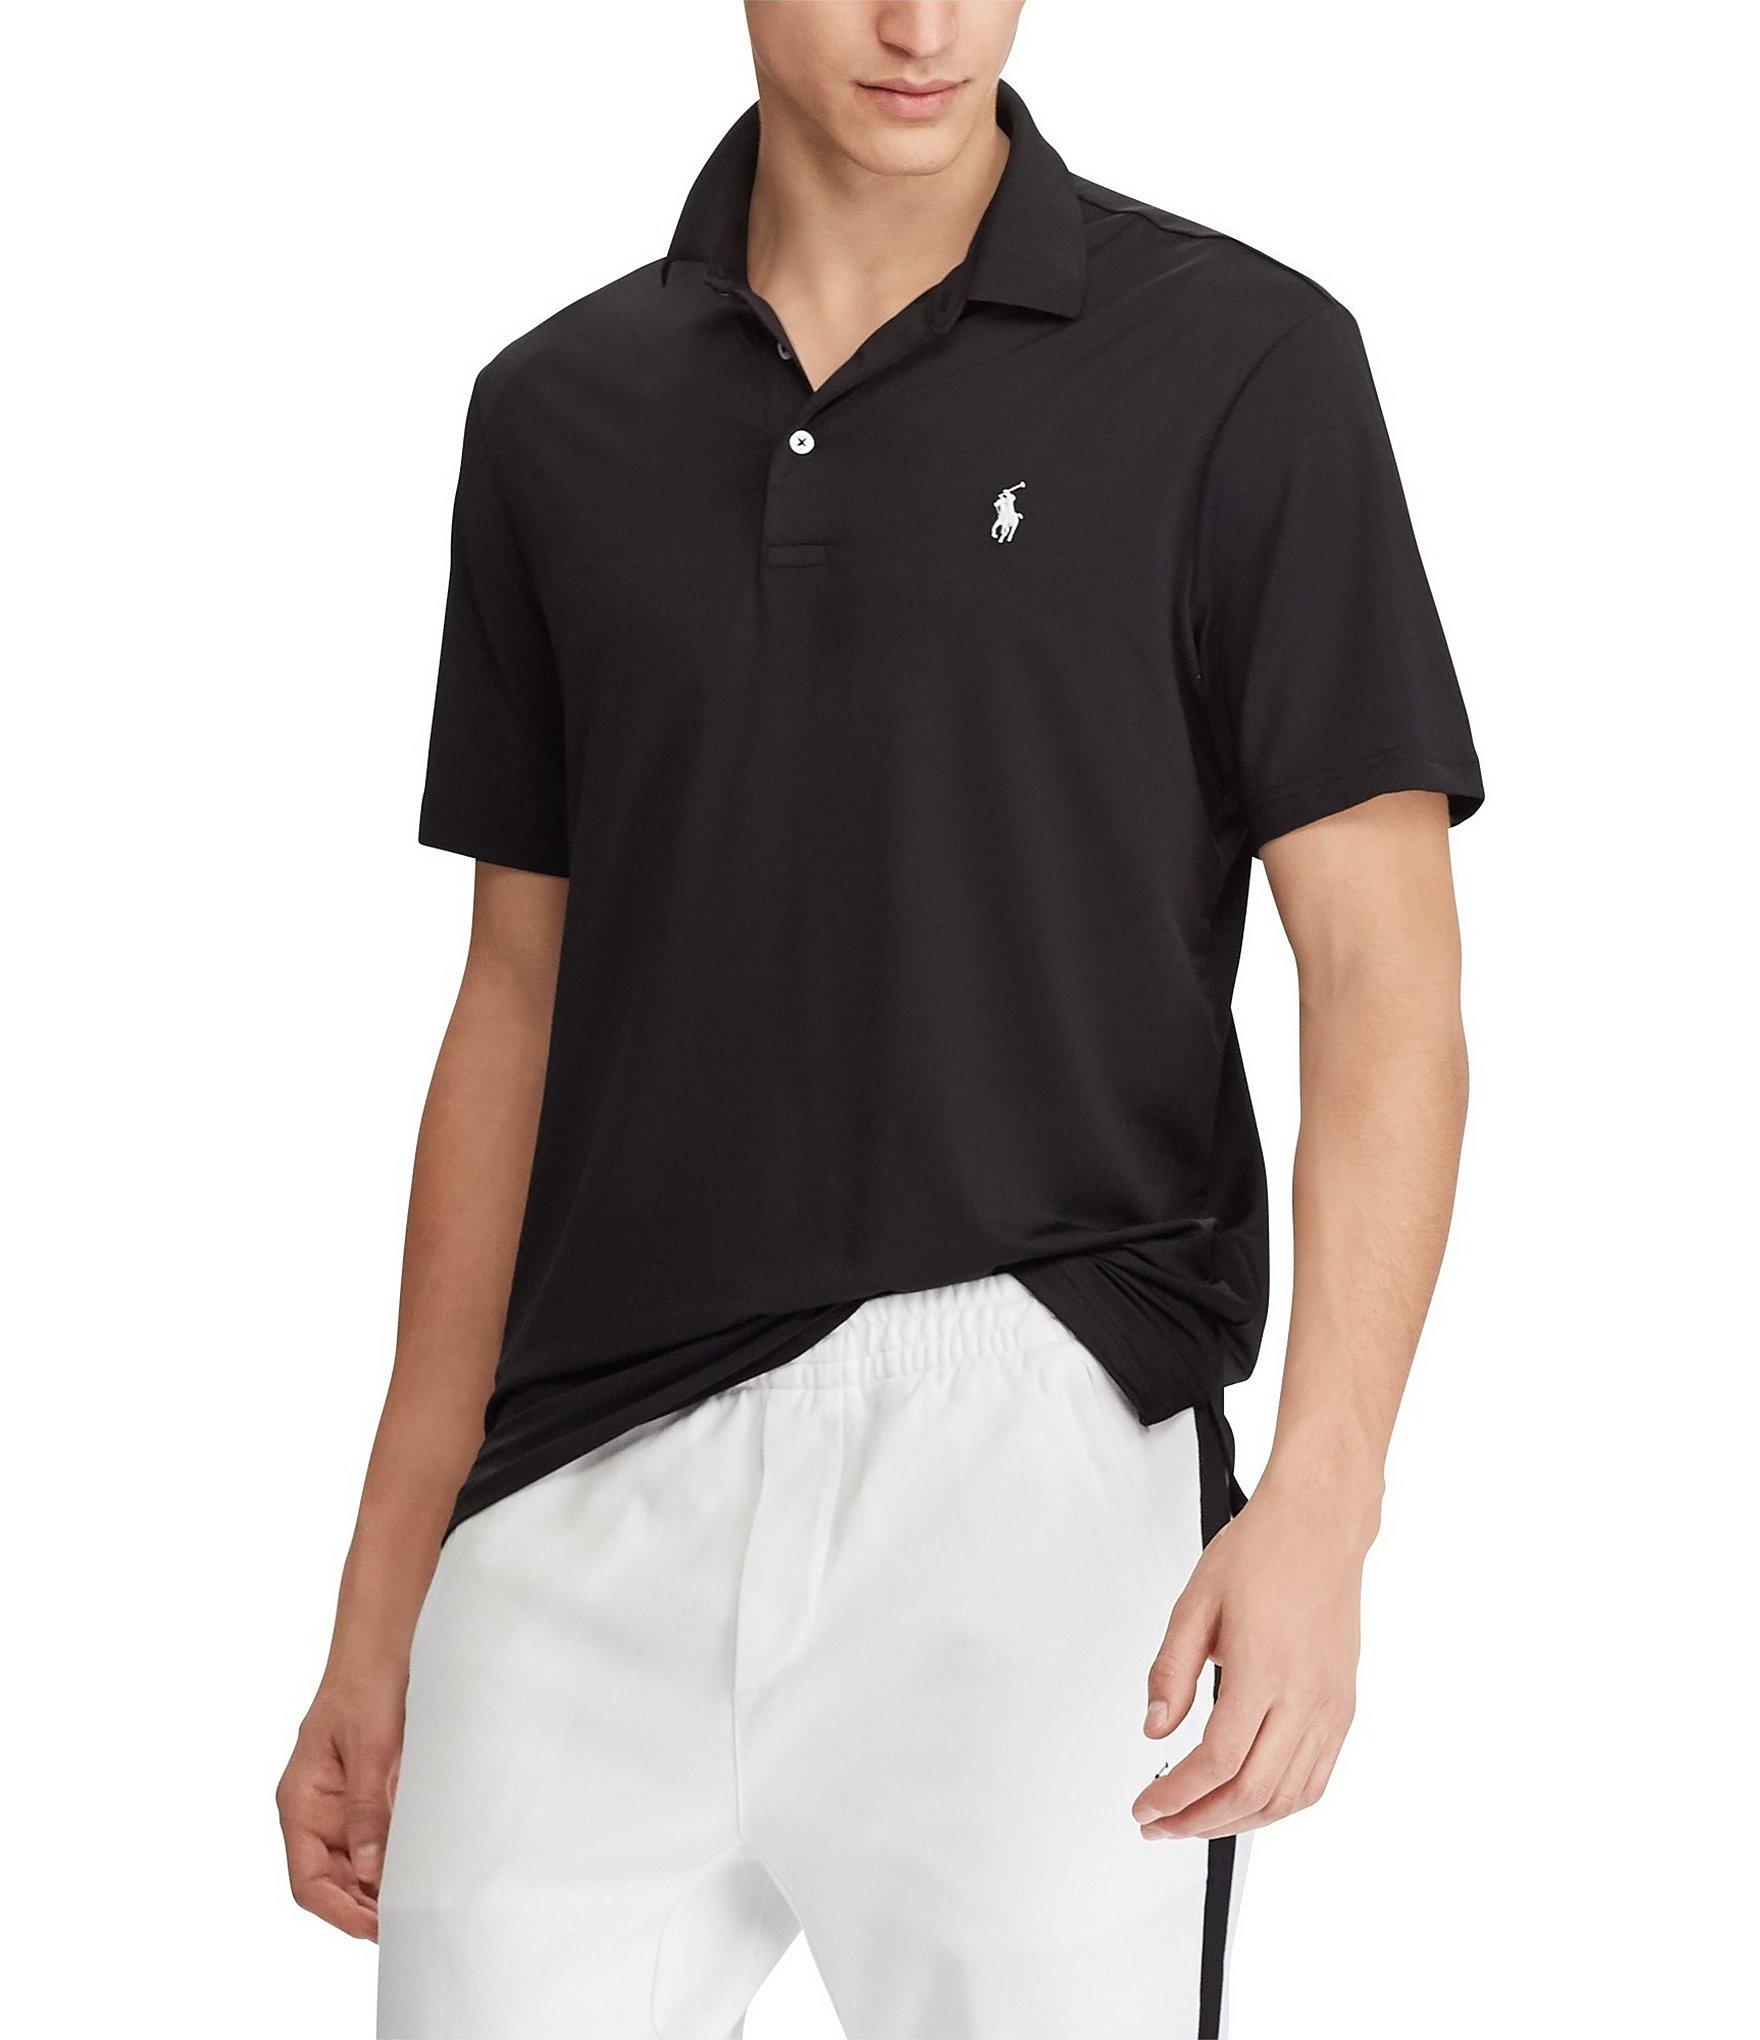 Black Mens Casual Polo Shirts Dillards